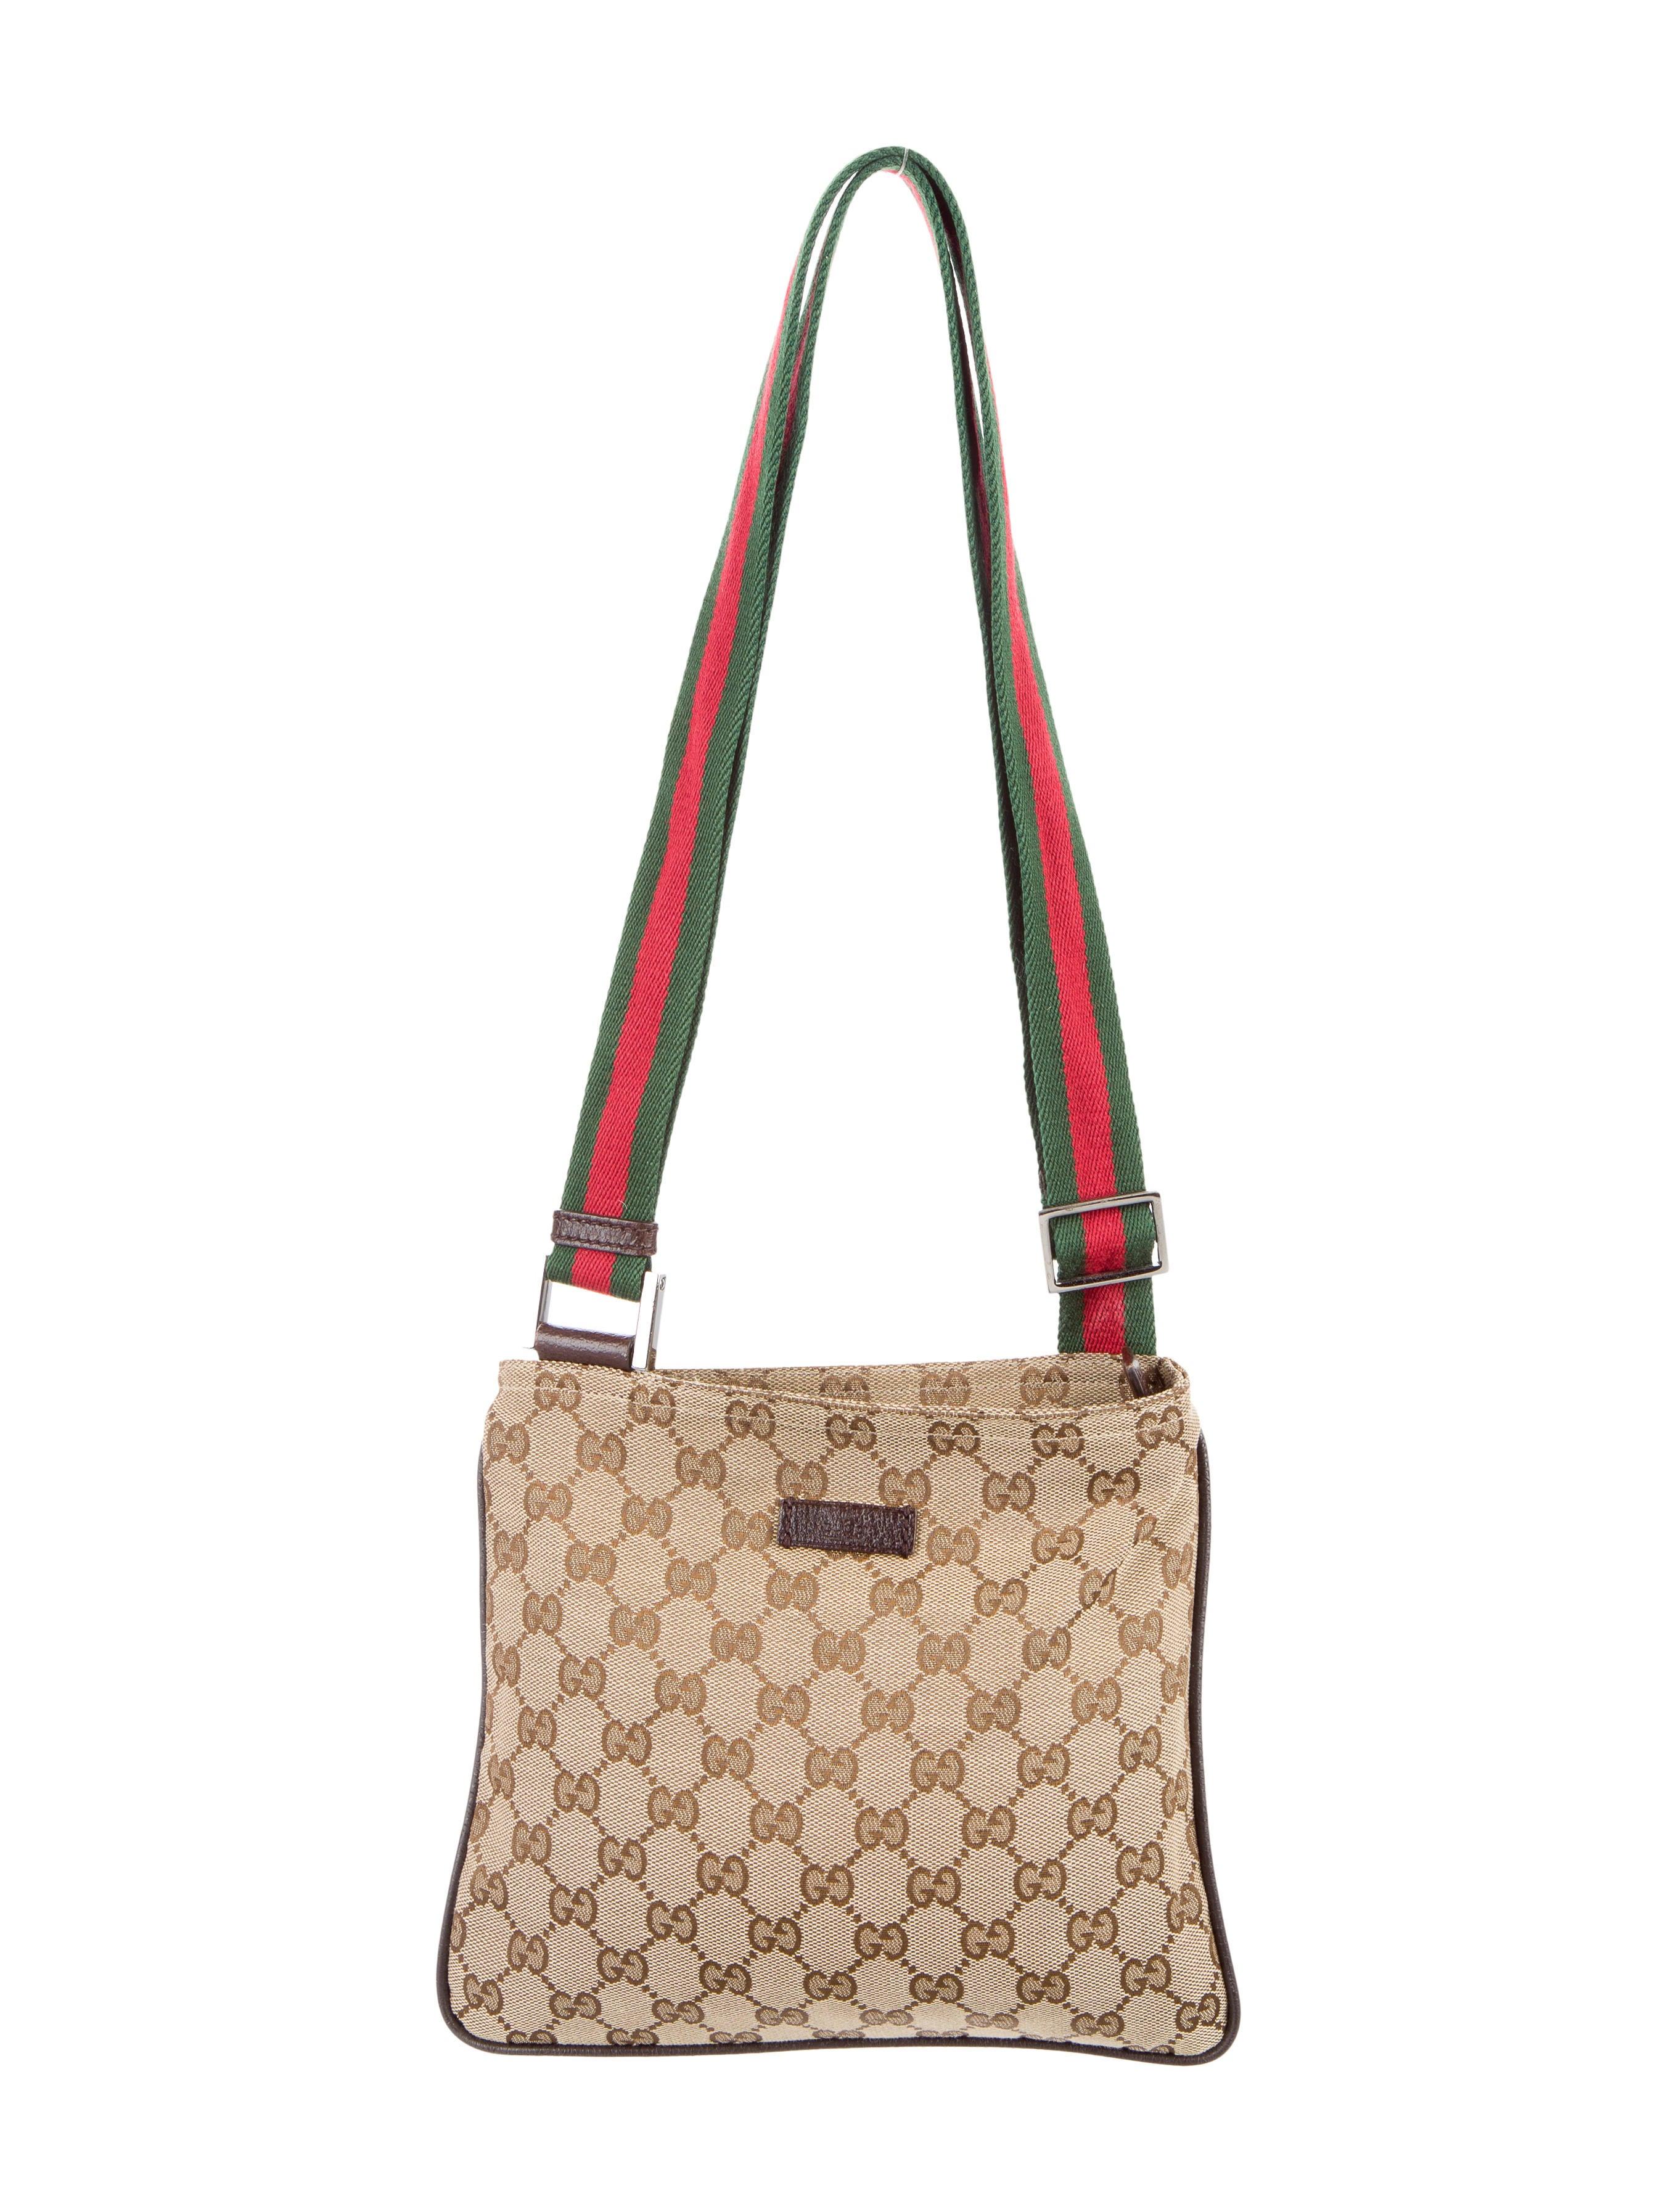 gucci gg canvas messenger bag handbags guc135900 the realreal. Black Bedroom Furniture Sets. Home Design Ideas